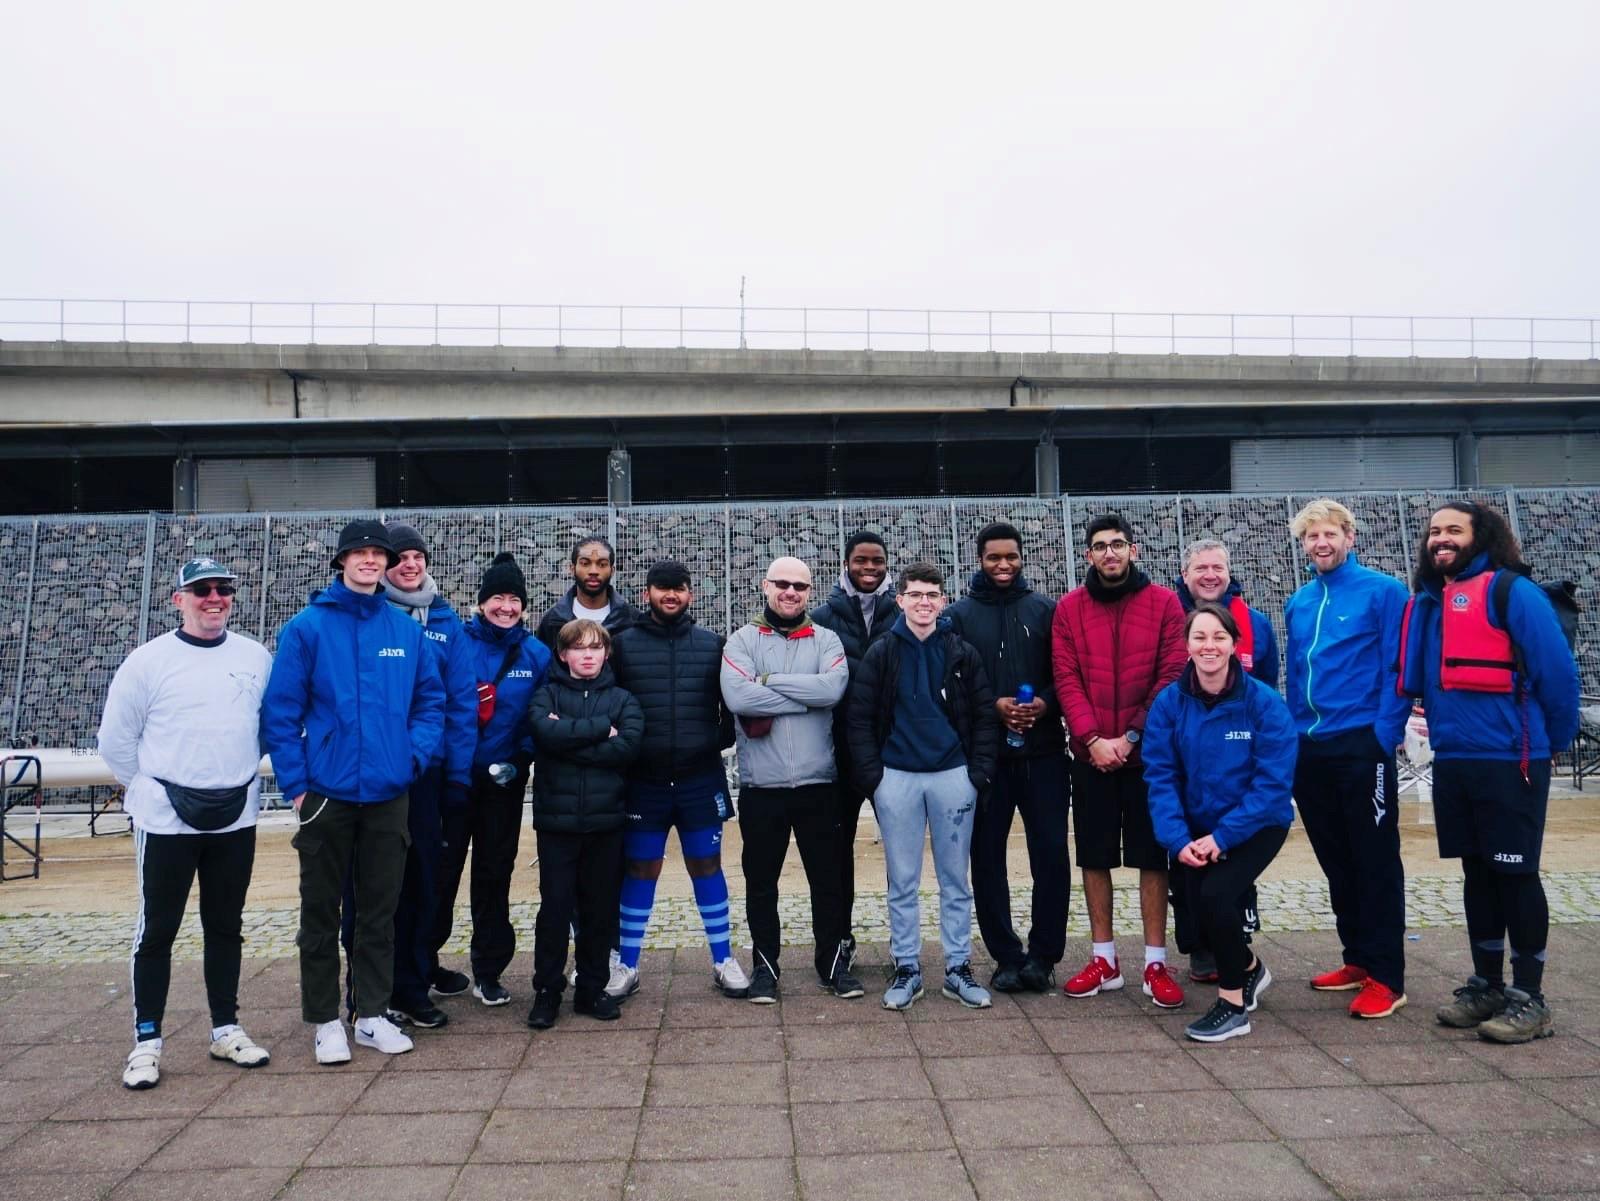 LDE UTC Rowing Club proudly working alongside CROSSFIT elite